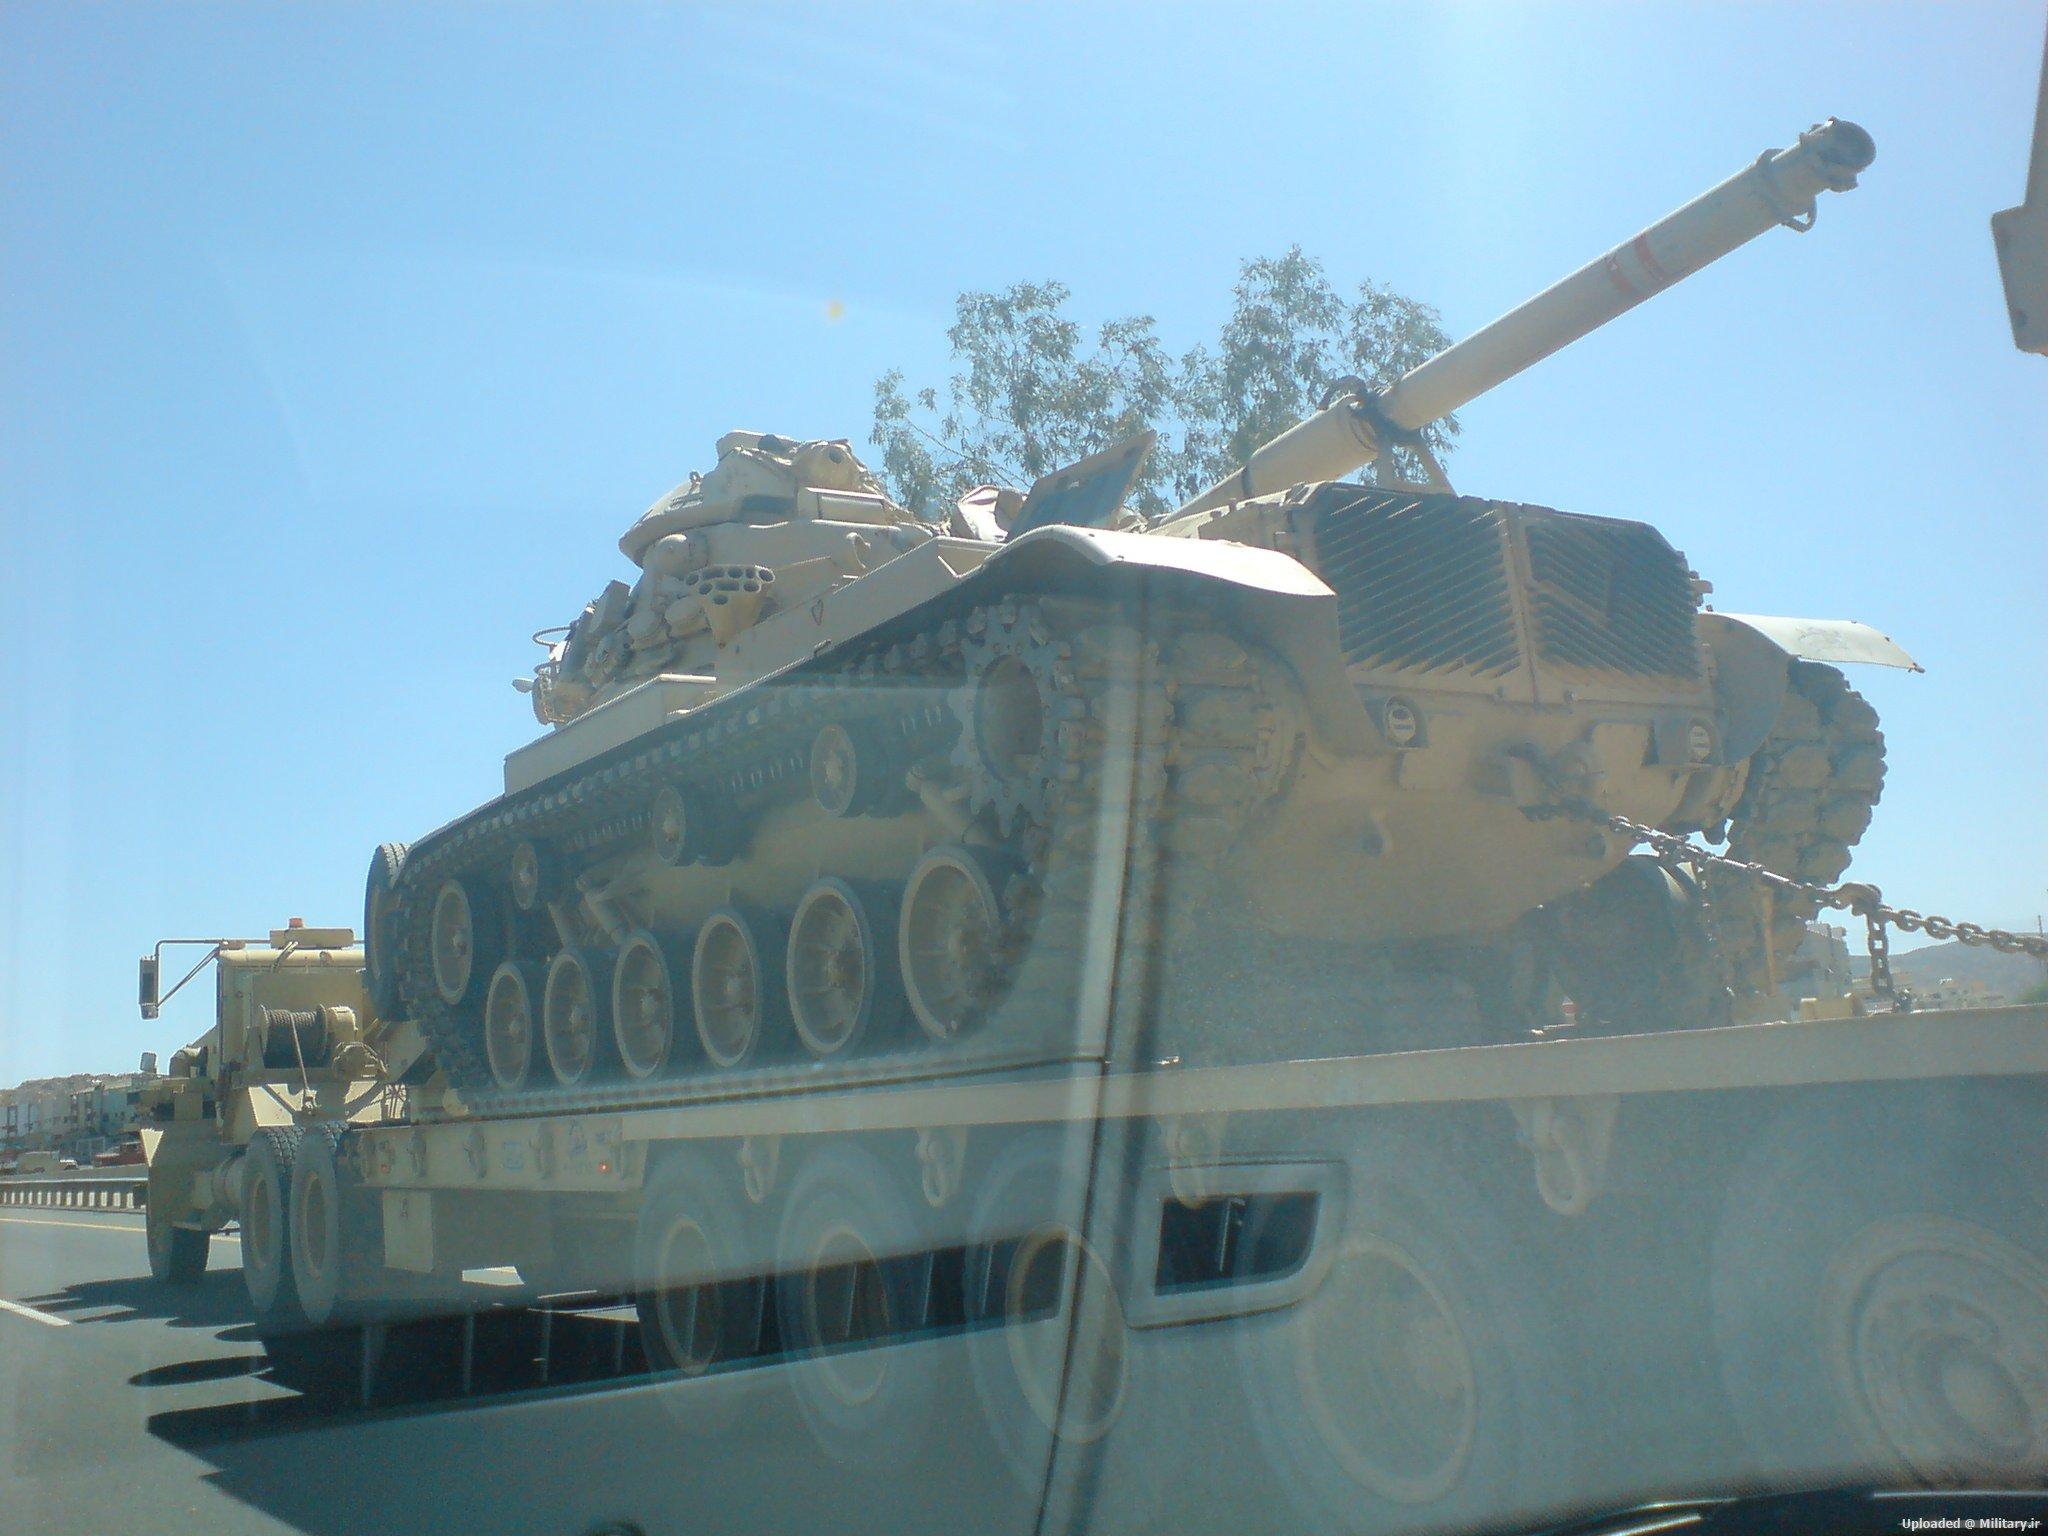 RSLF_Tank.JPG